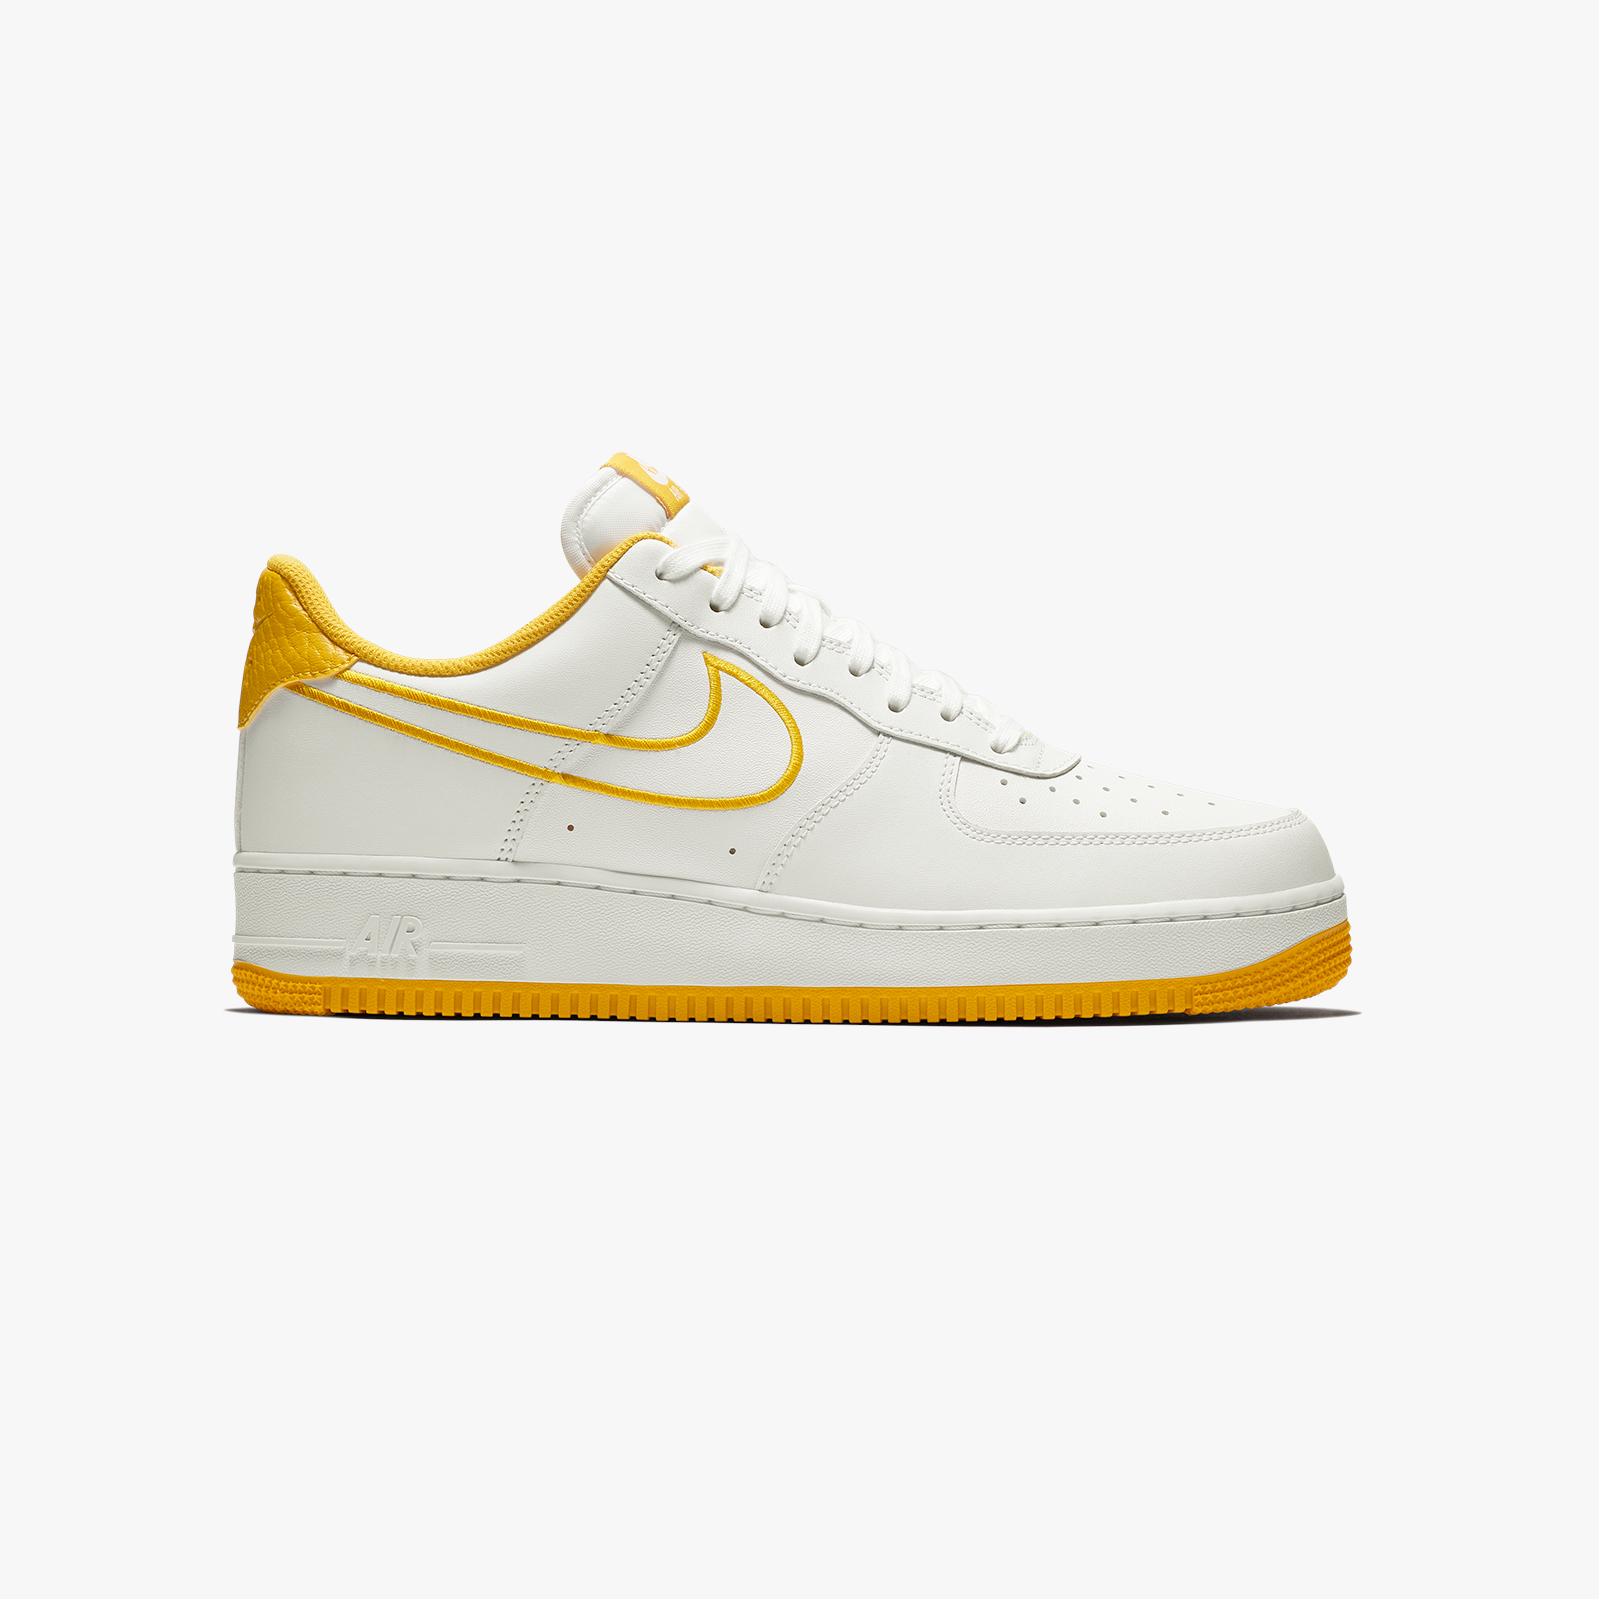 Nike Air Force 1 07 Leather Aj7280 101 Sneakersnstuff I